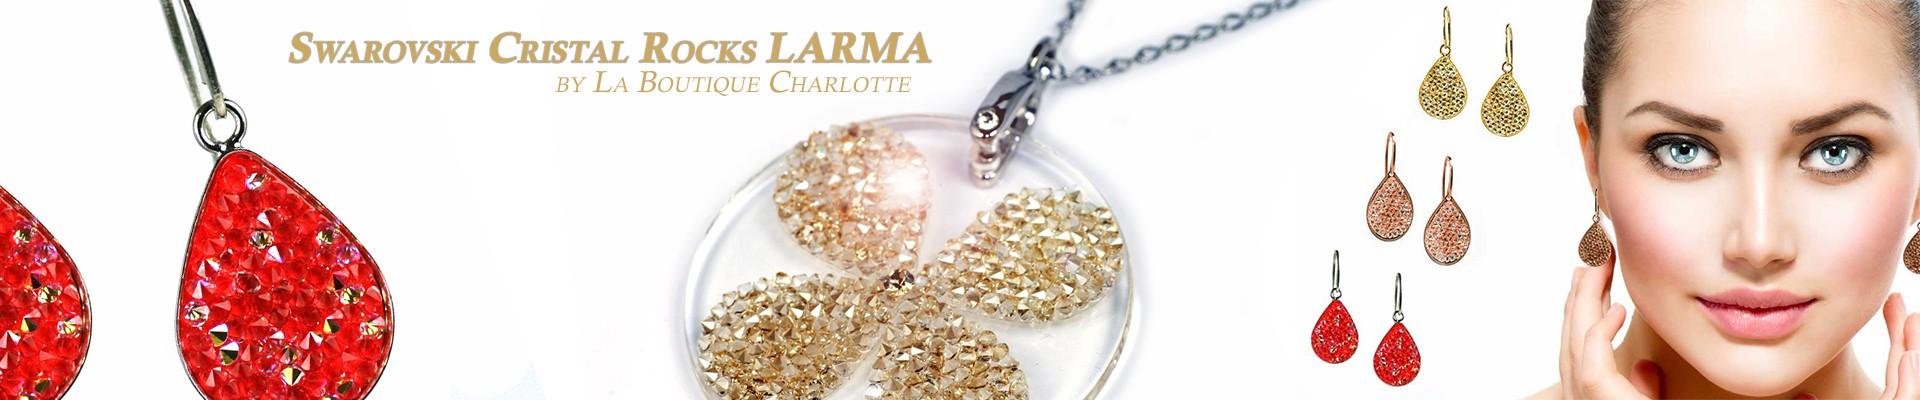 LARMA Cristal Rocks Swarovski